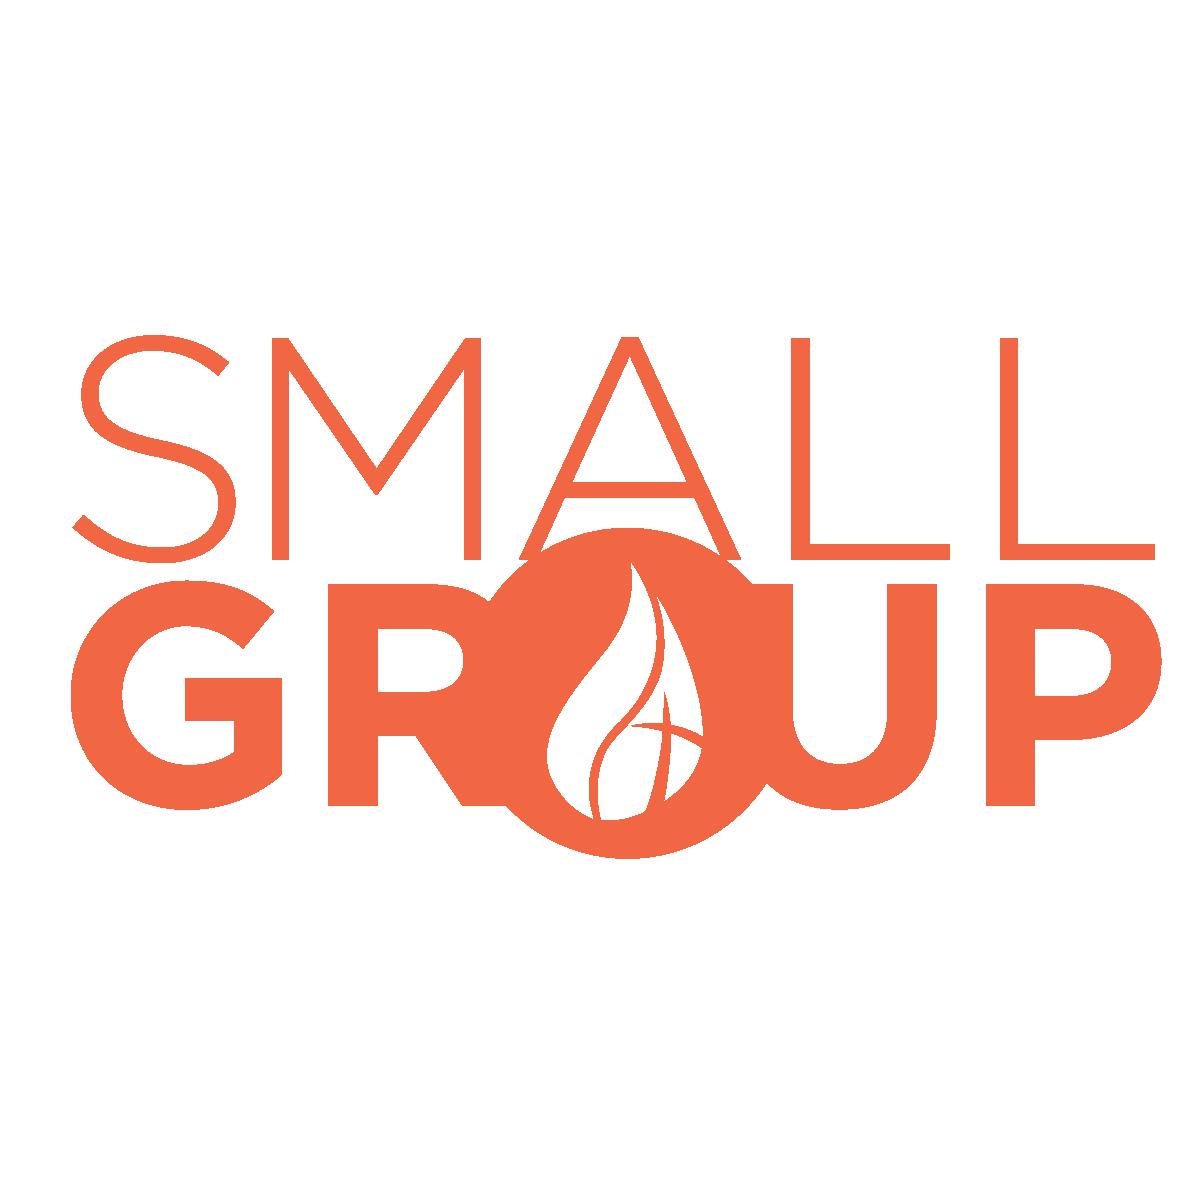 Small groups final logo orange